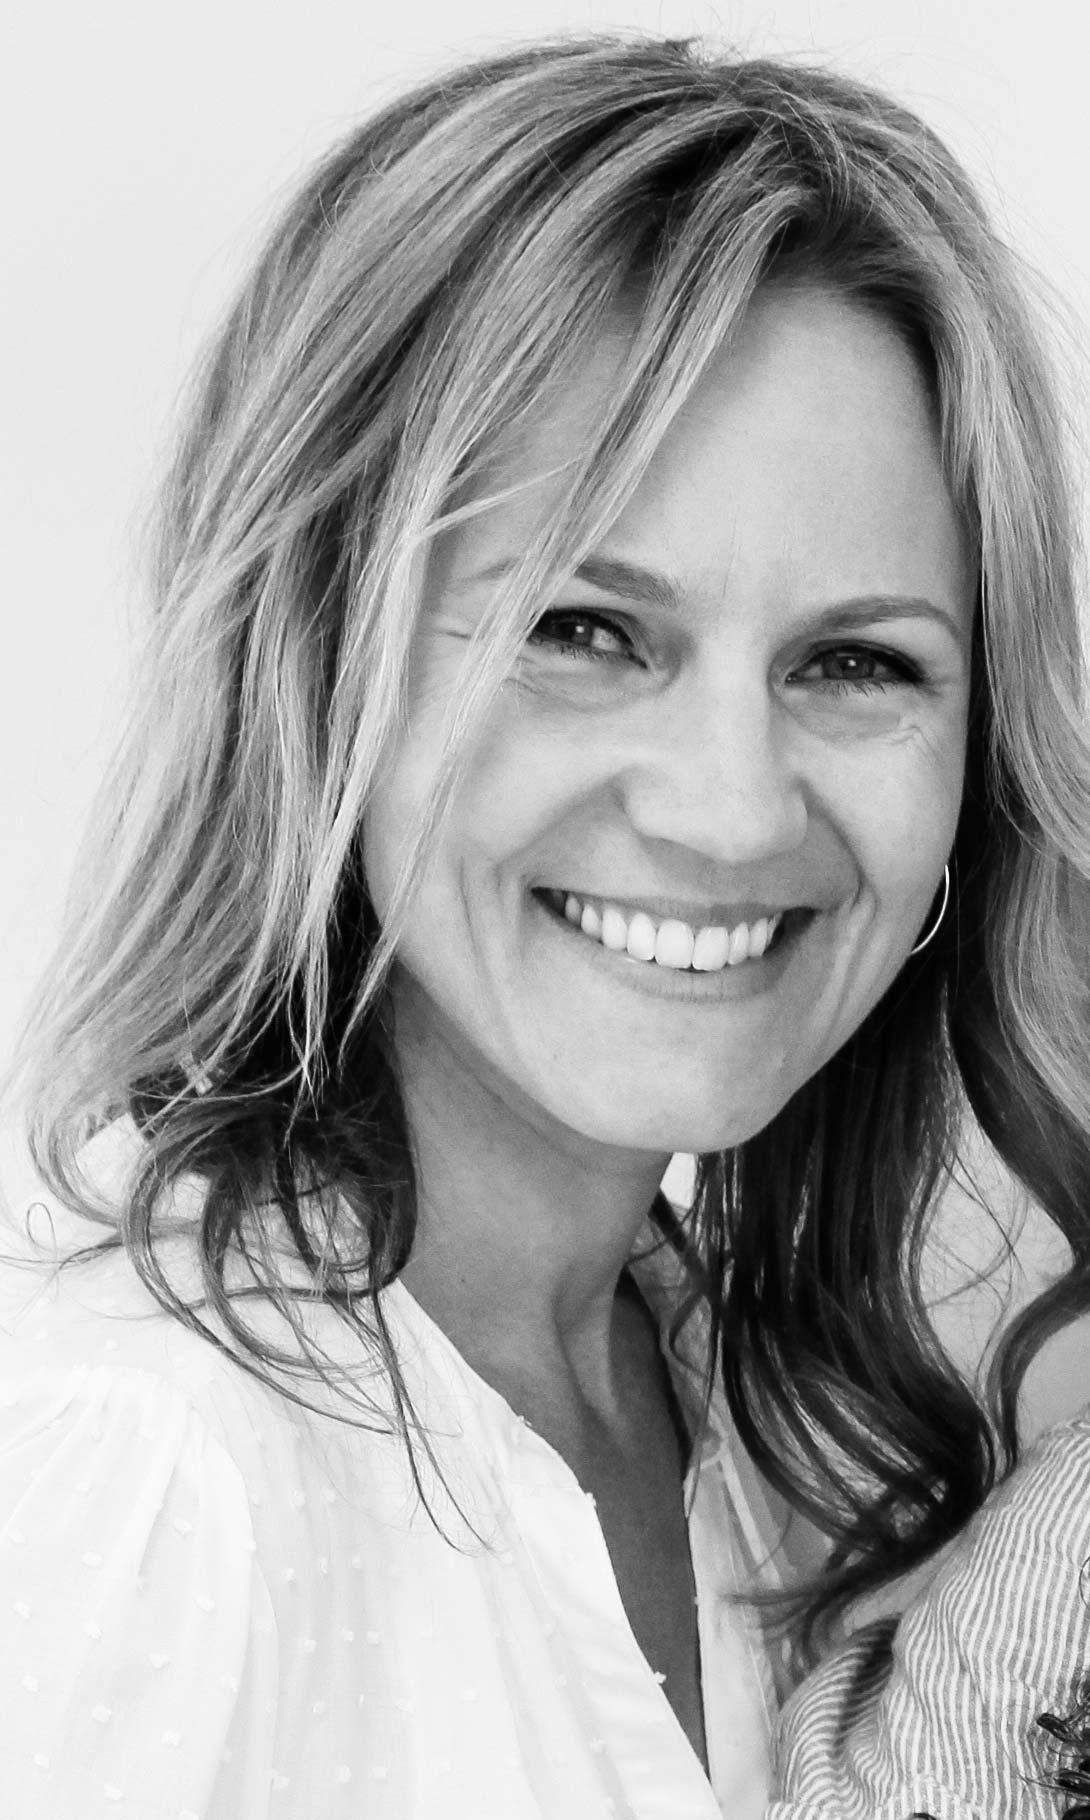 Stylist Wendy Verhaegh